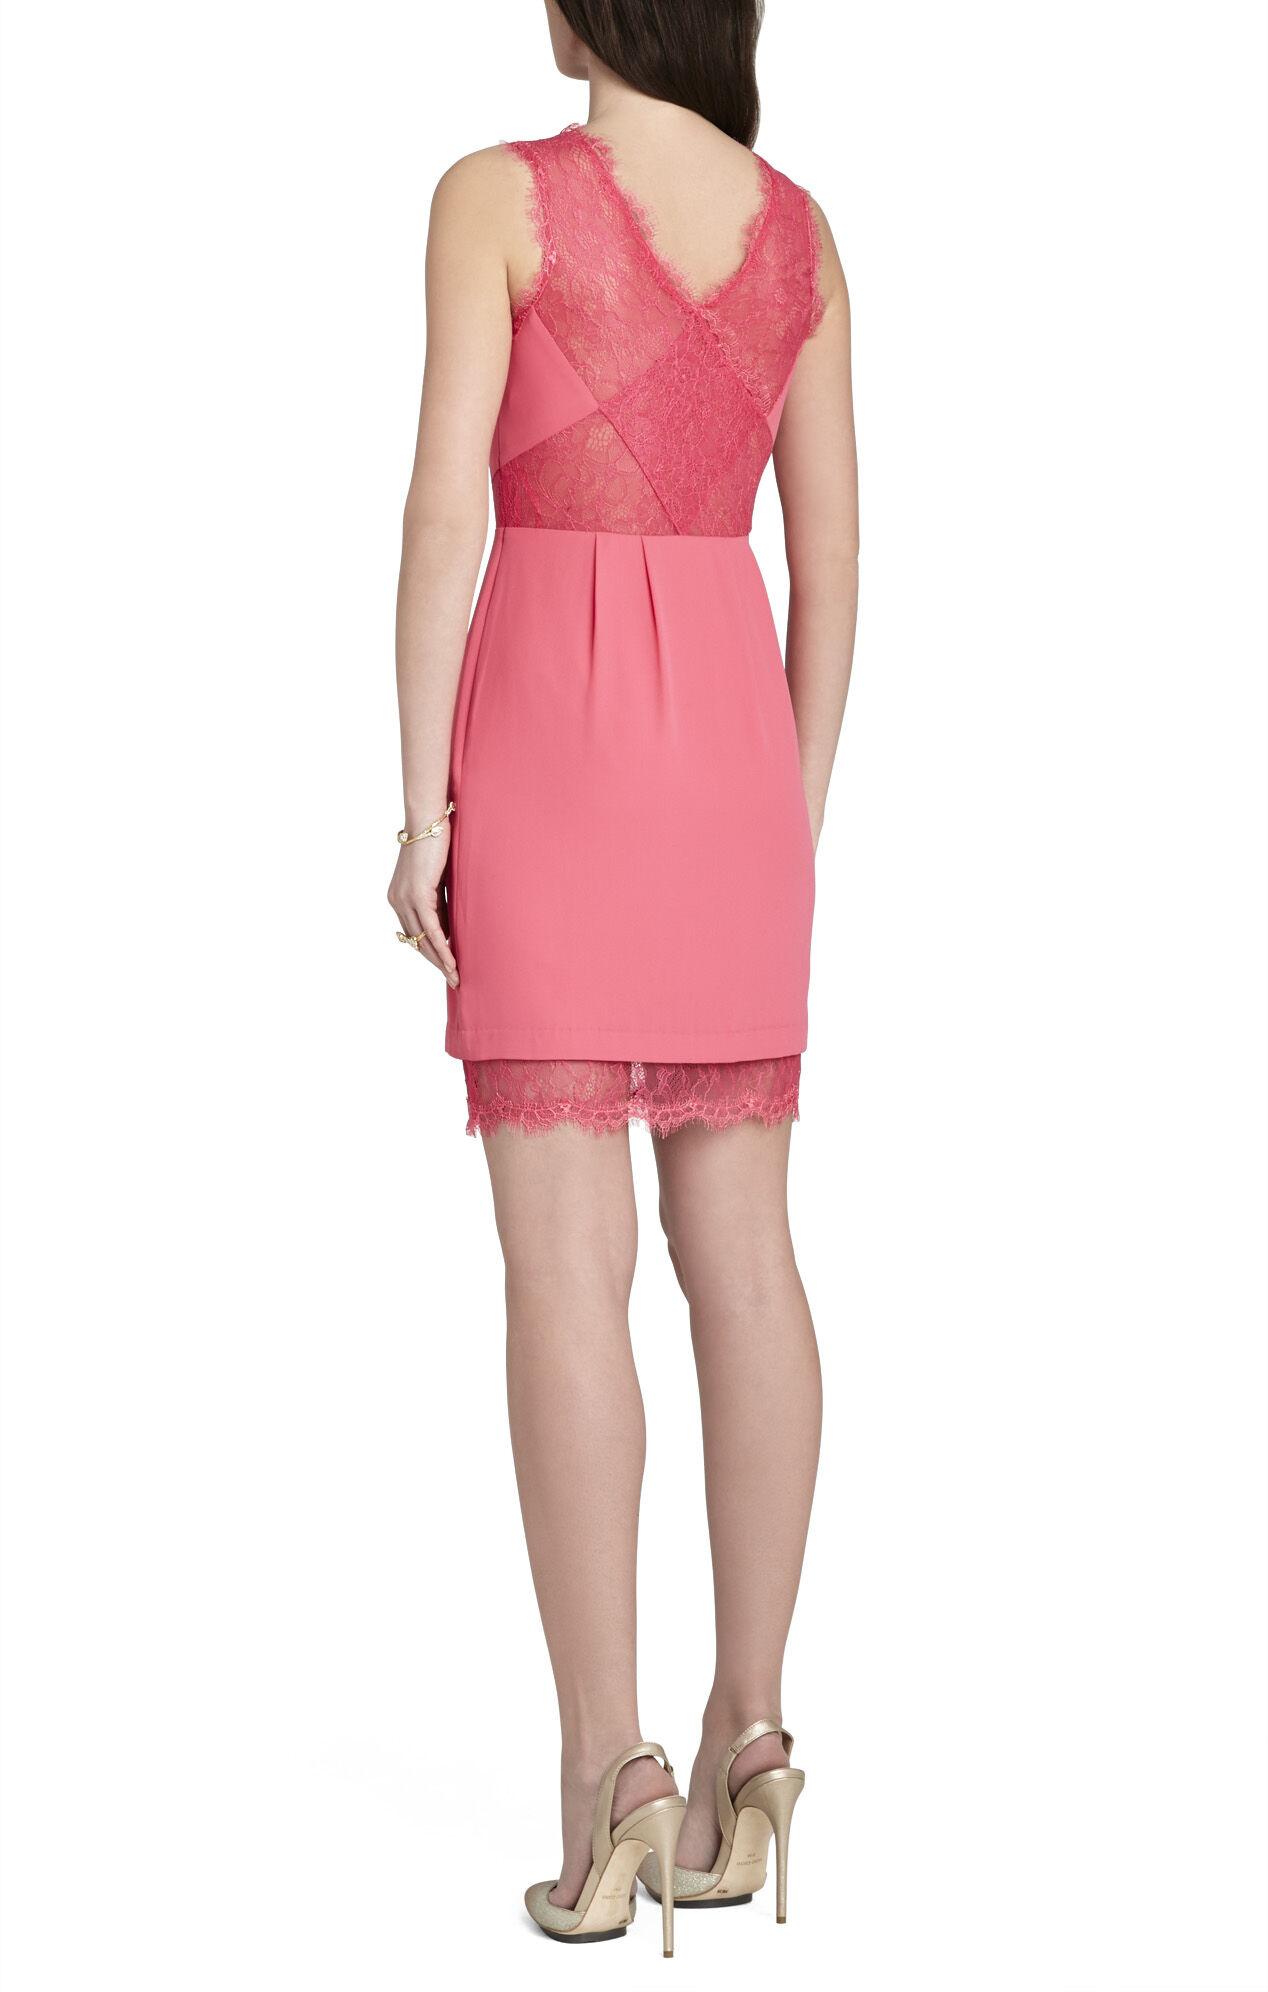 Bcbg pink lace cocktail dress